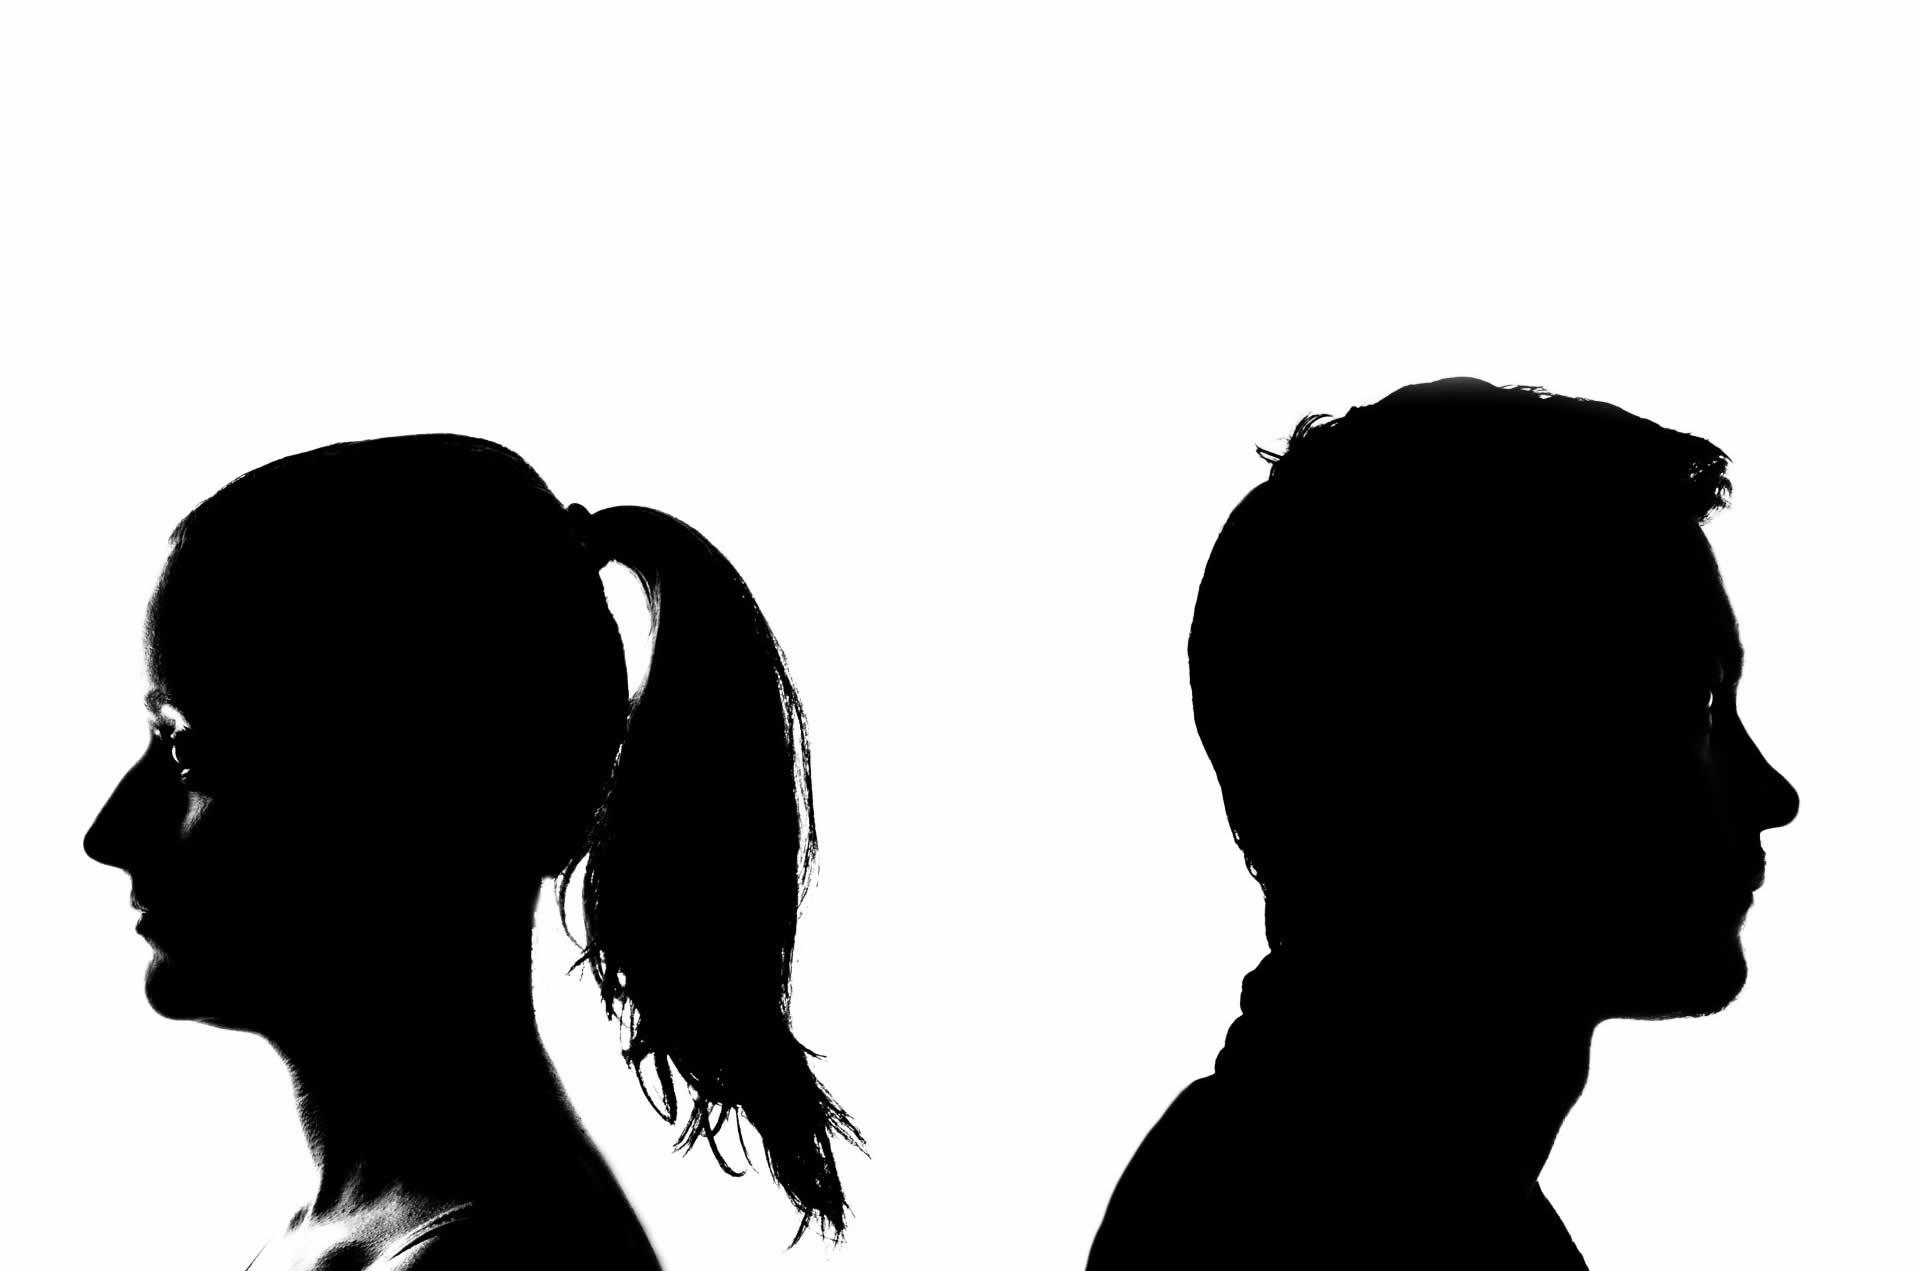 Infidelity: the breaking of trust